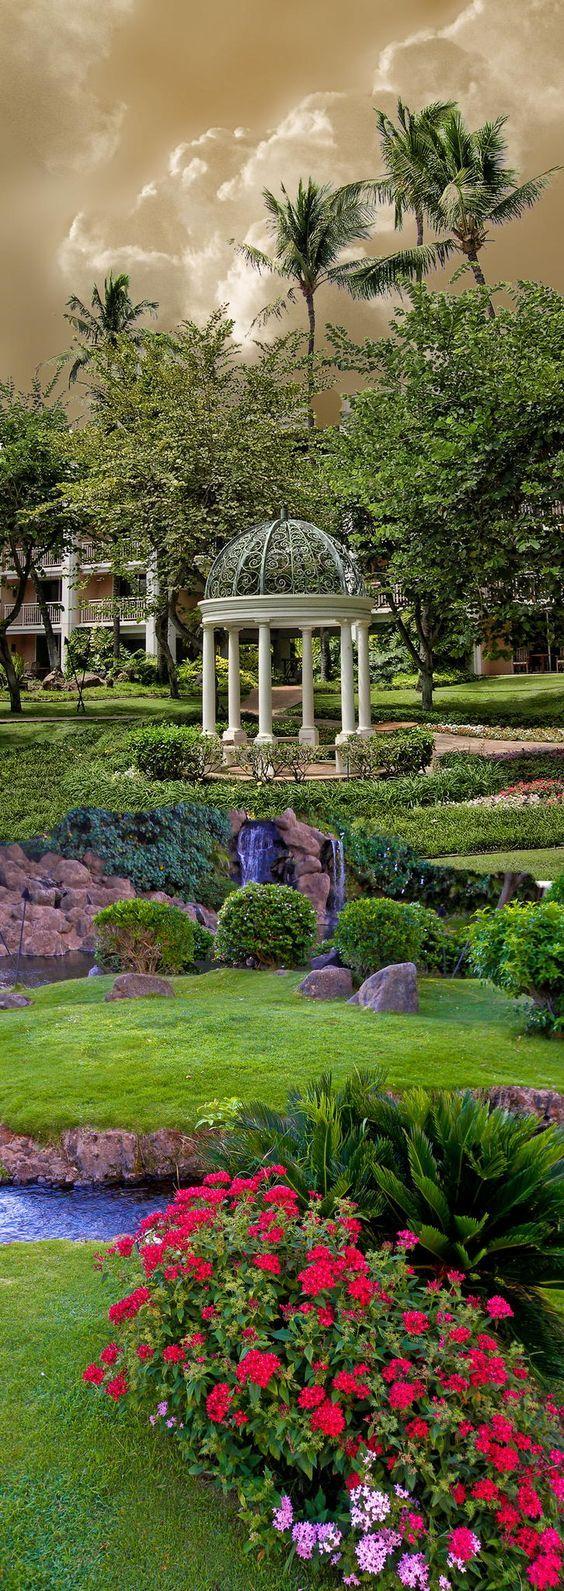 1000 ideas about garden gazebo on pinterest gazebo